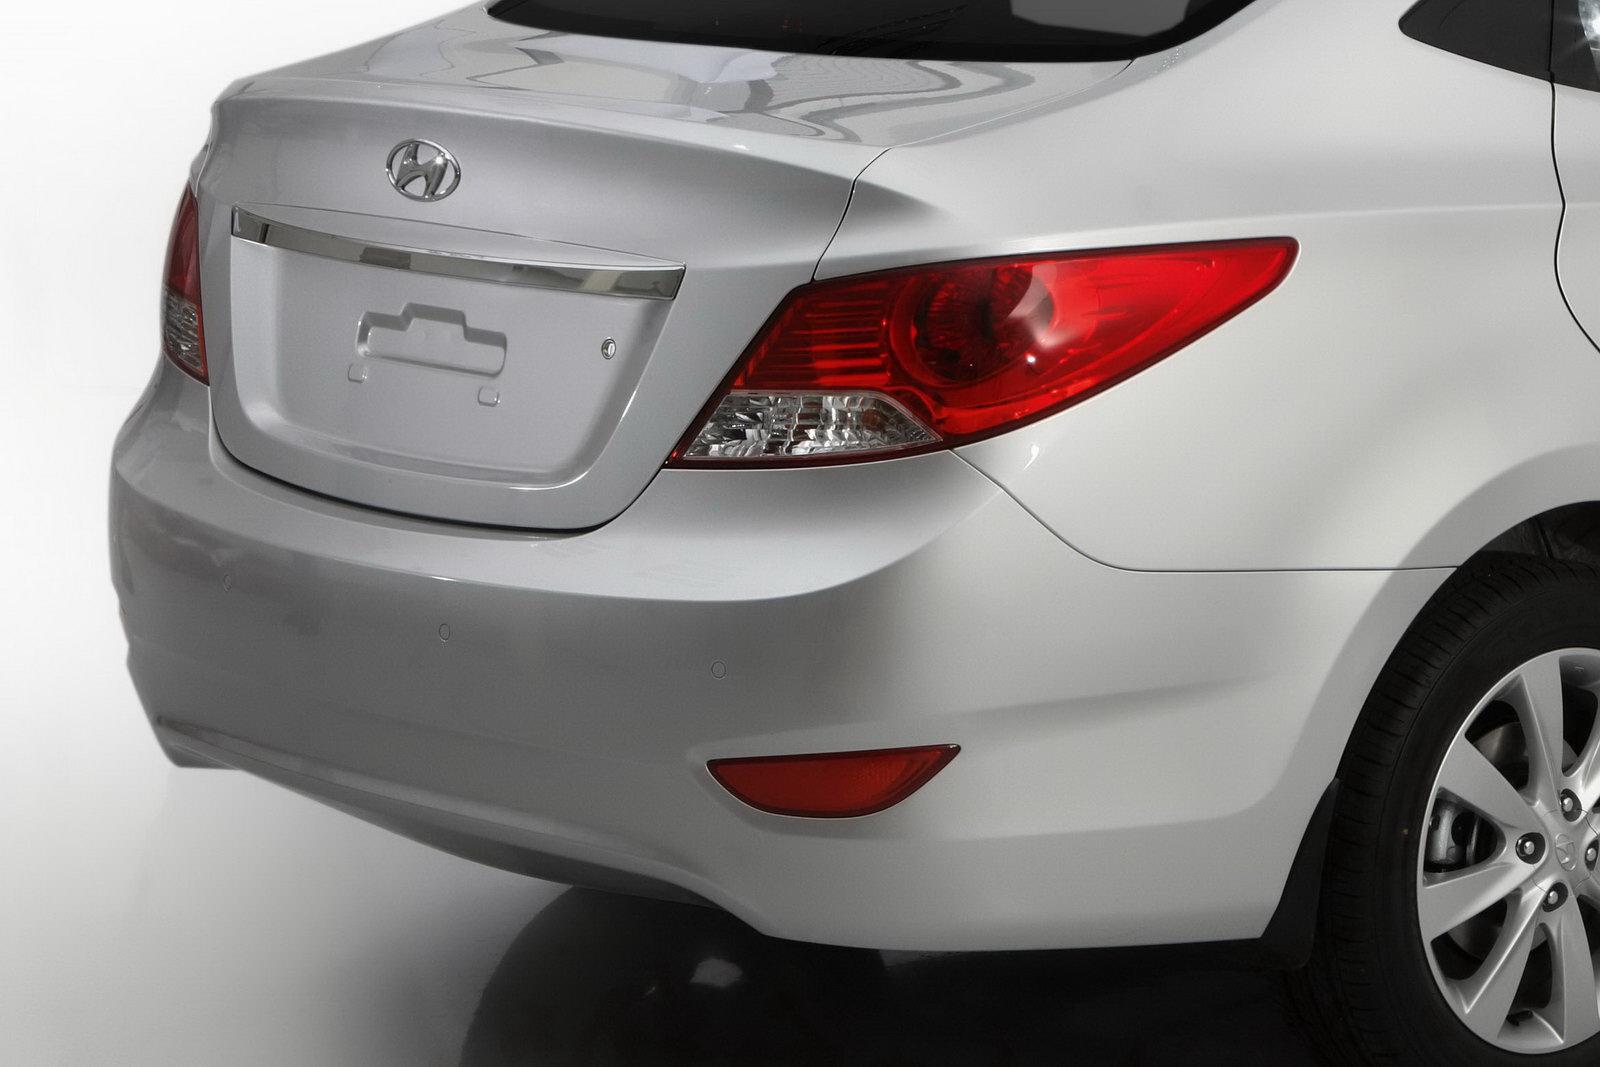 2011 Hyundai Solaris Is Announced For Russia